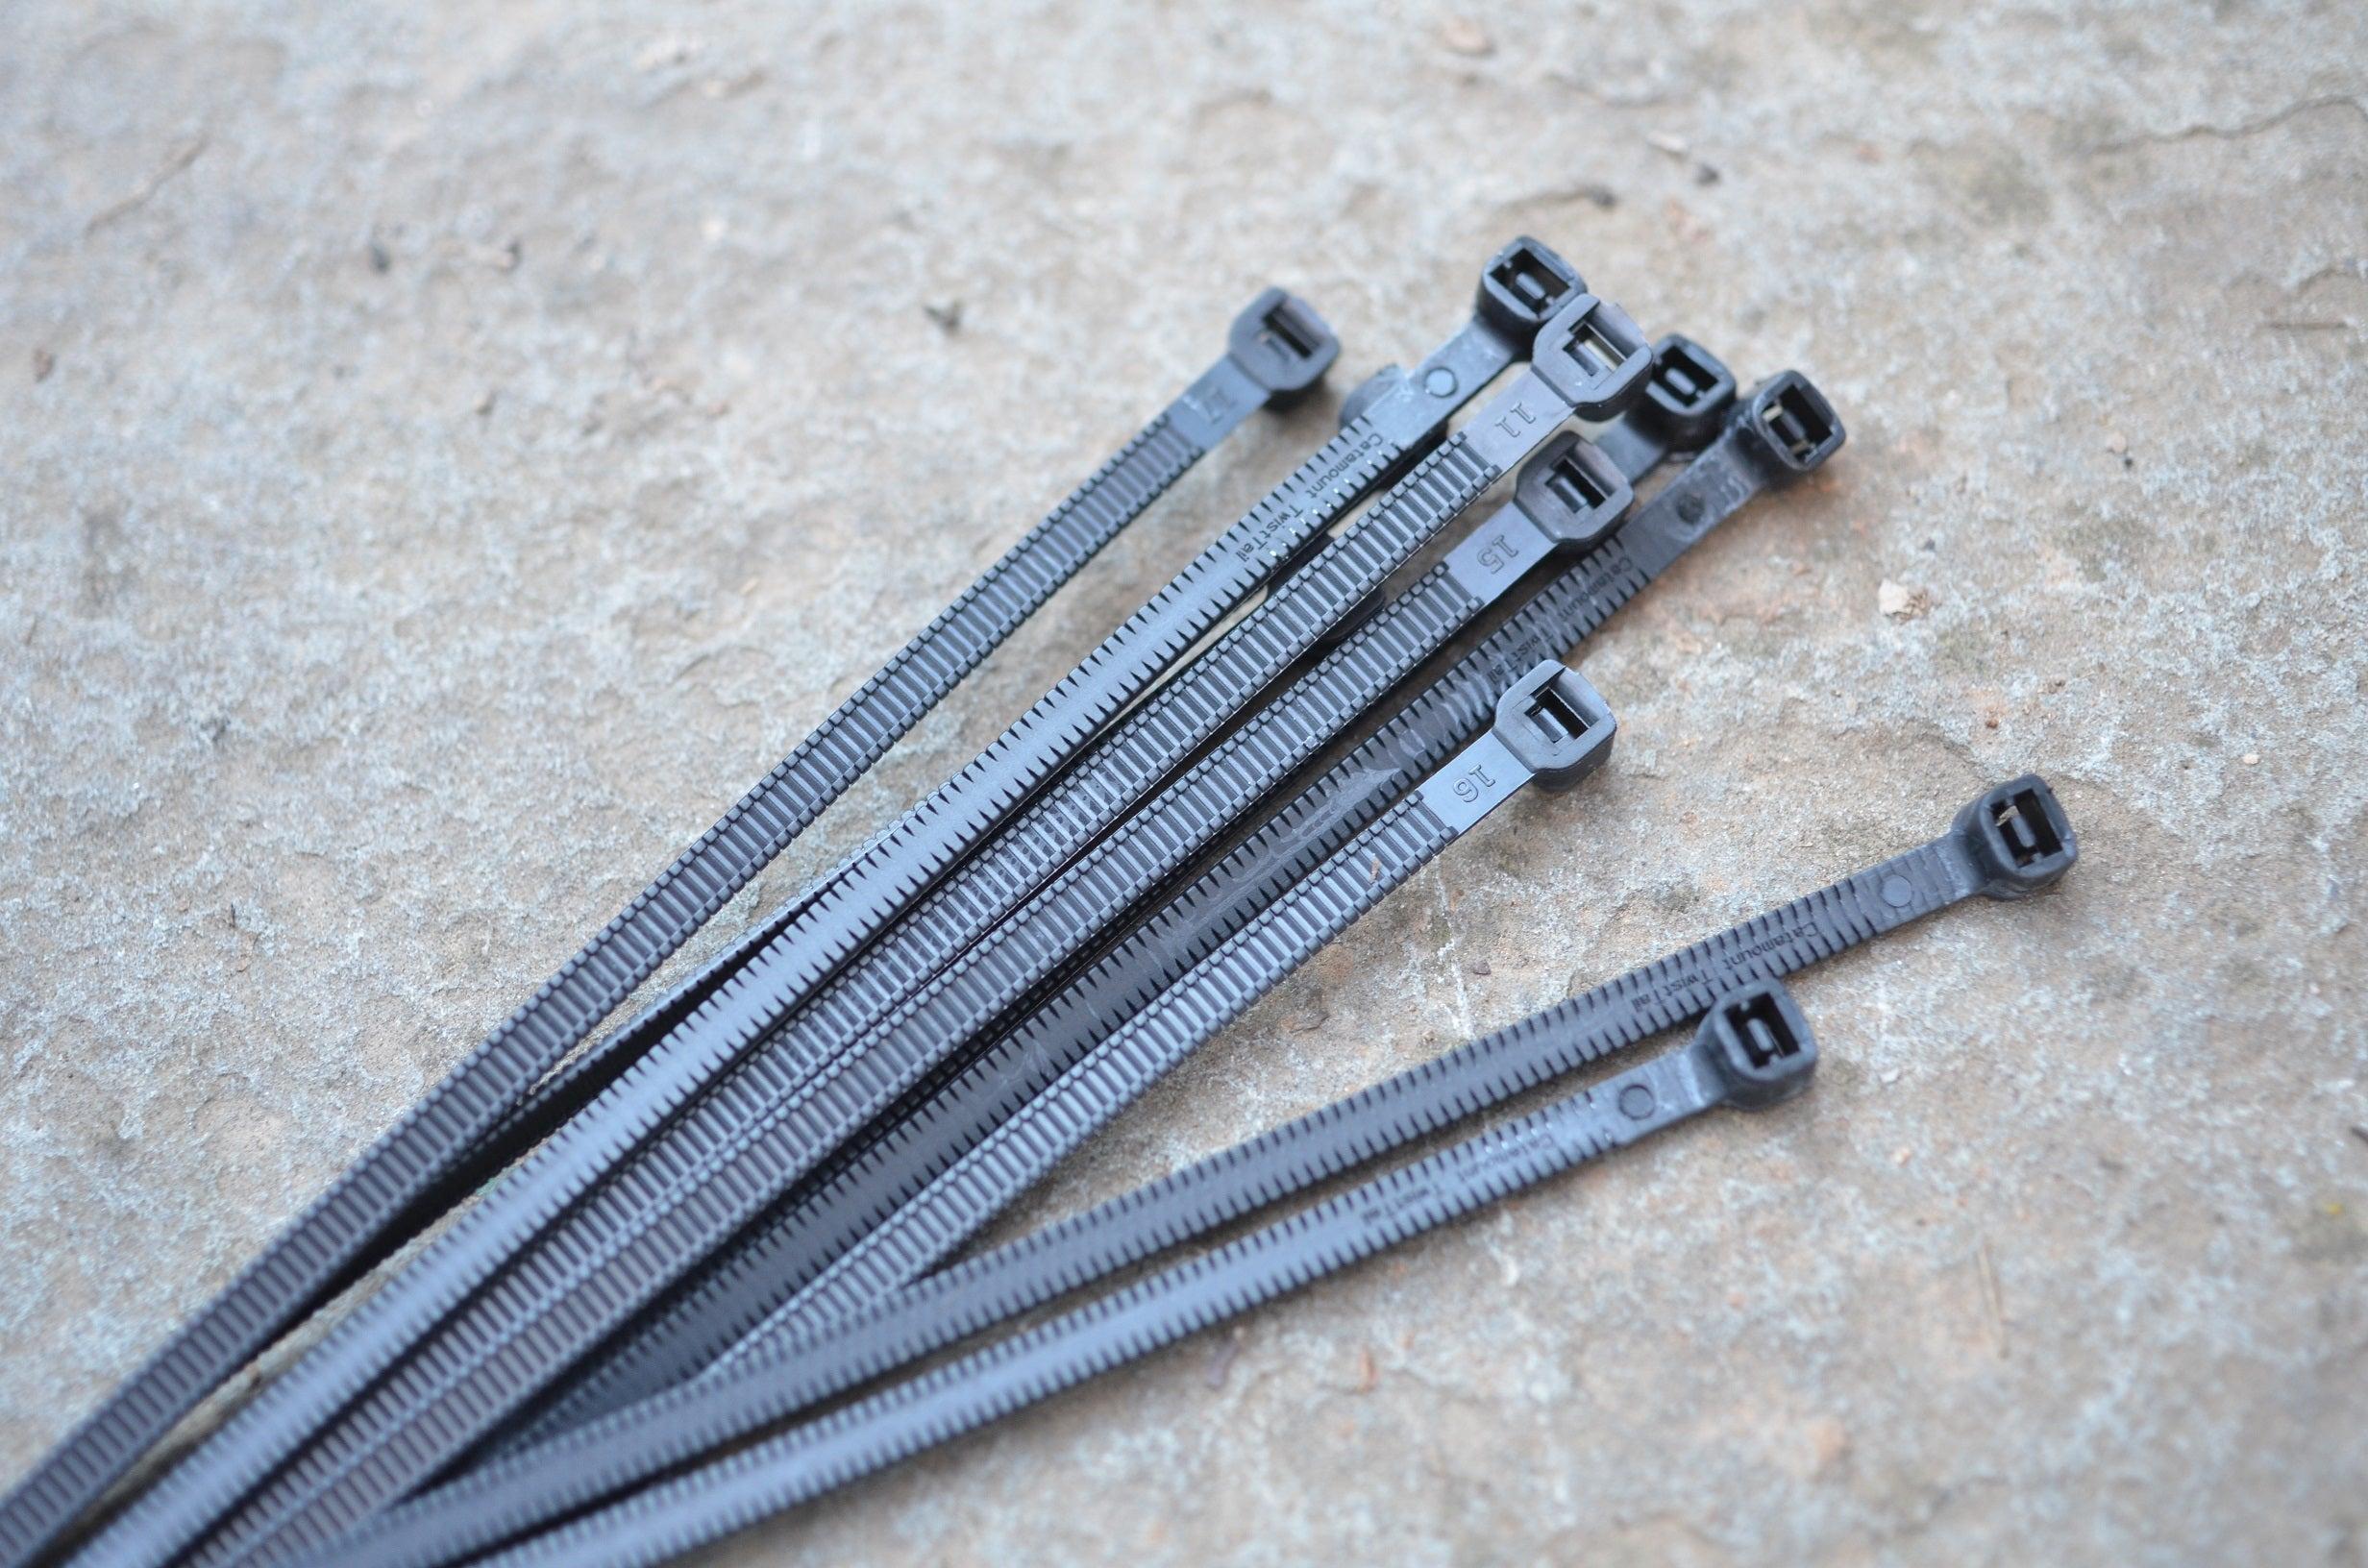 Survival Skills: 3 Ways To Escape Zip Tie Handcuffs